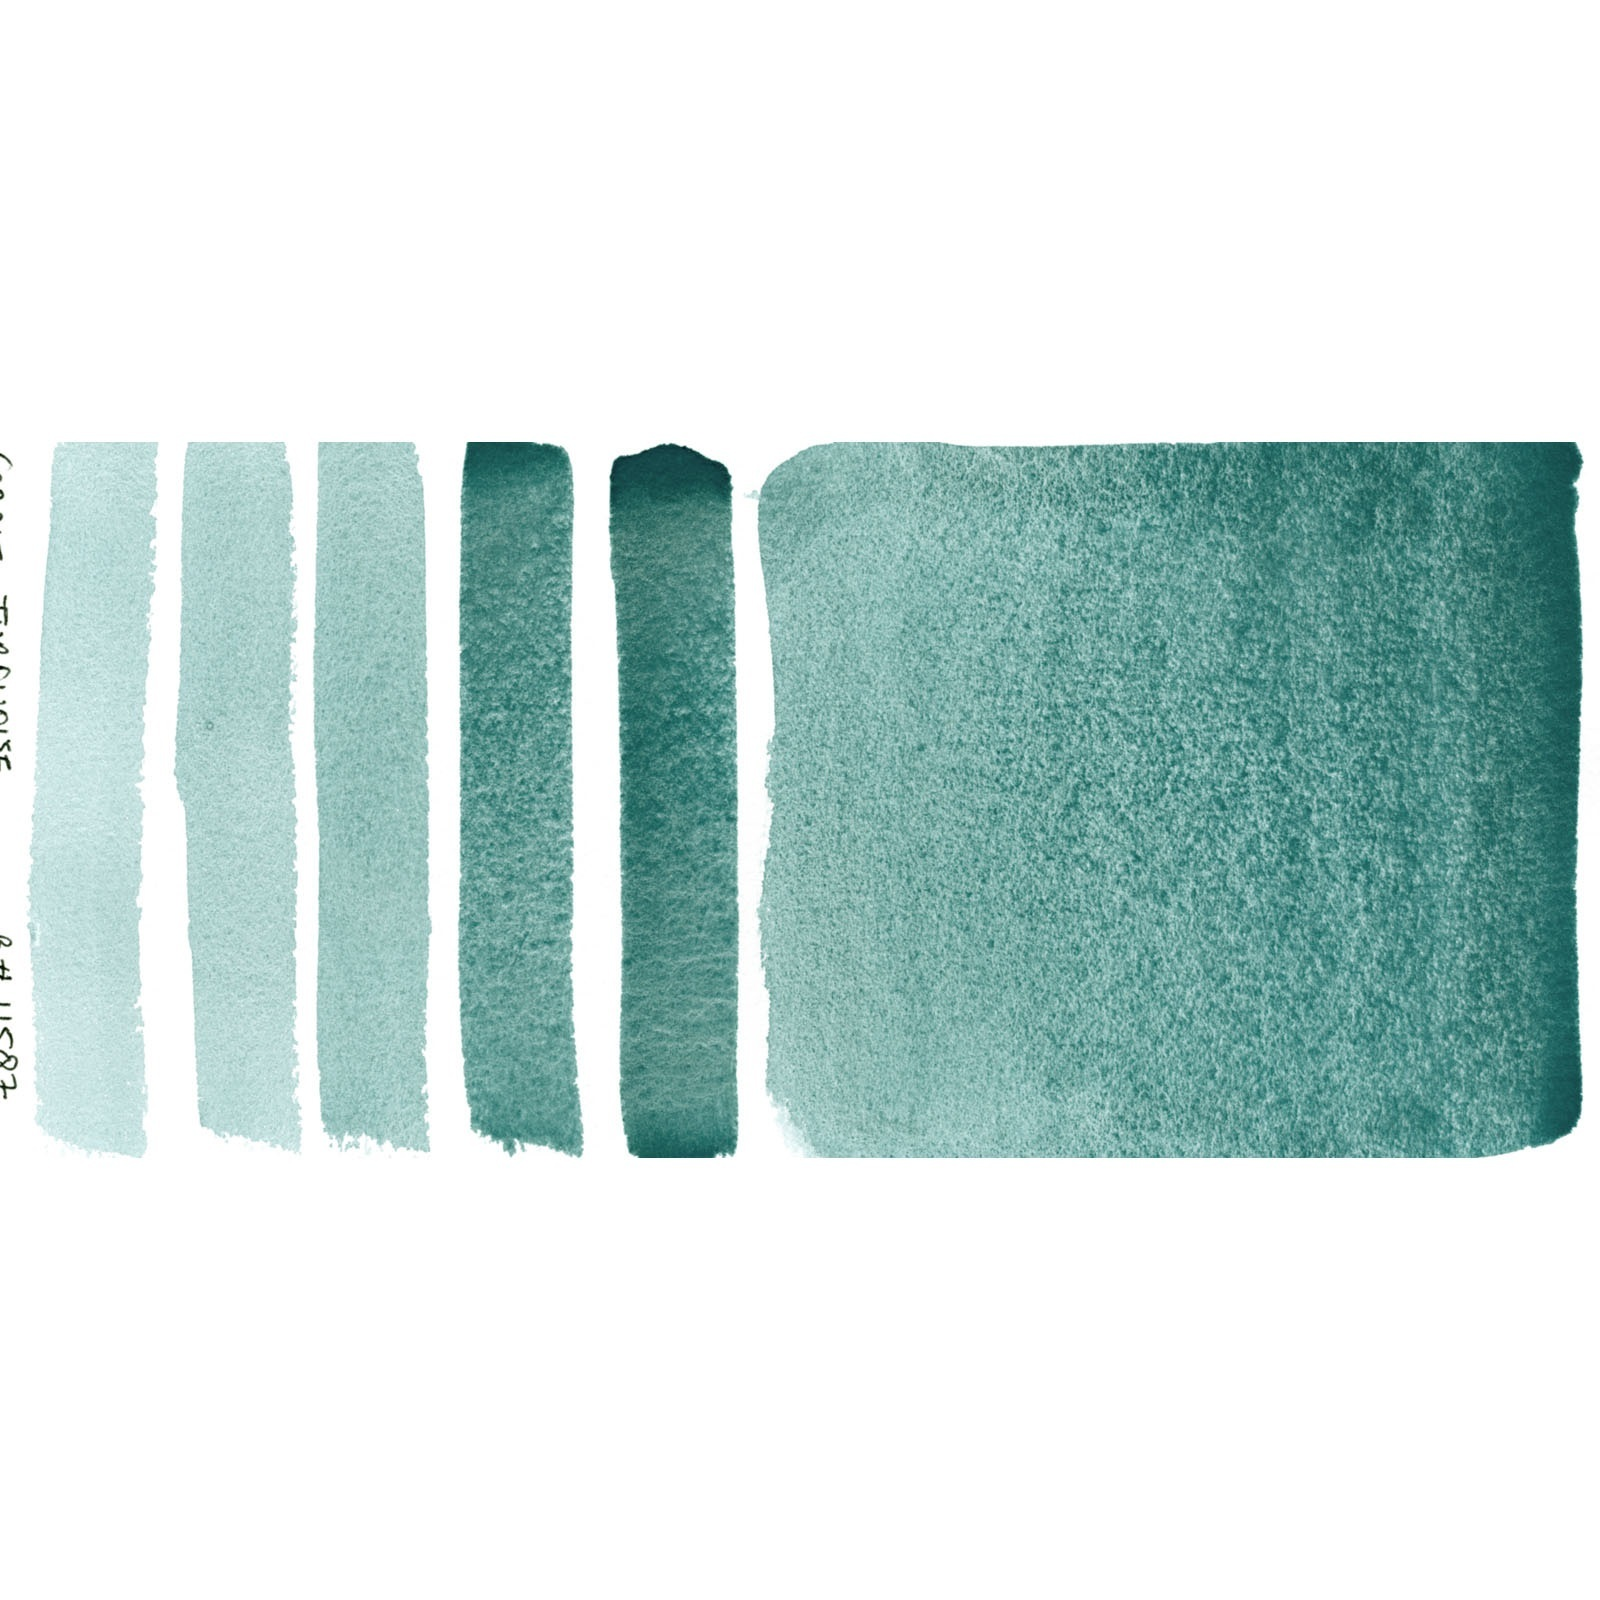 CobaltTurquoise_284600029.jpg